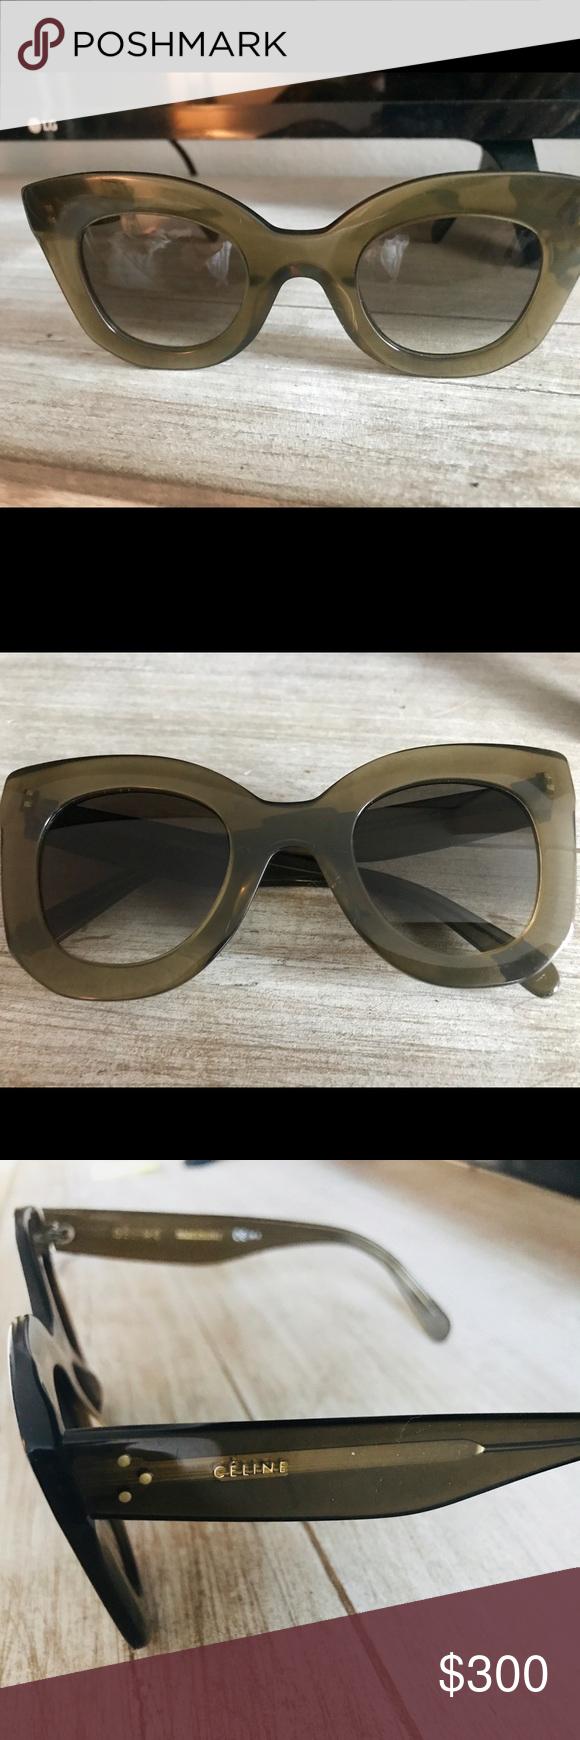 6b988ca5746 Celine Cat Eye Olive Green Sunglasses 46mm Beautiful Celine cat eye  sunglasses. Excellent used condition